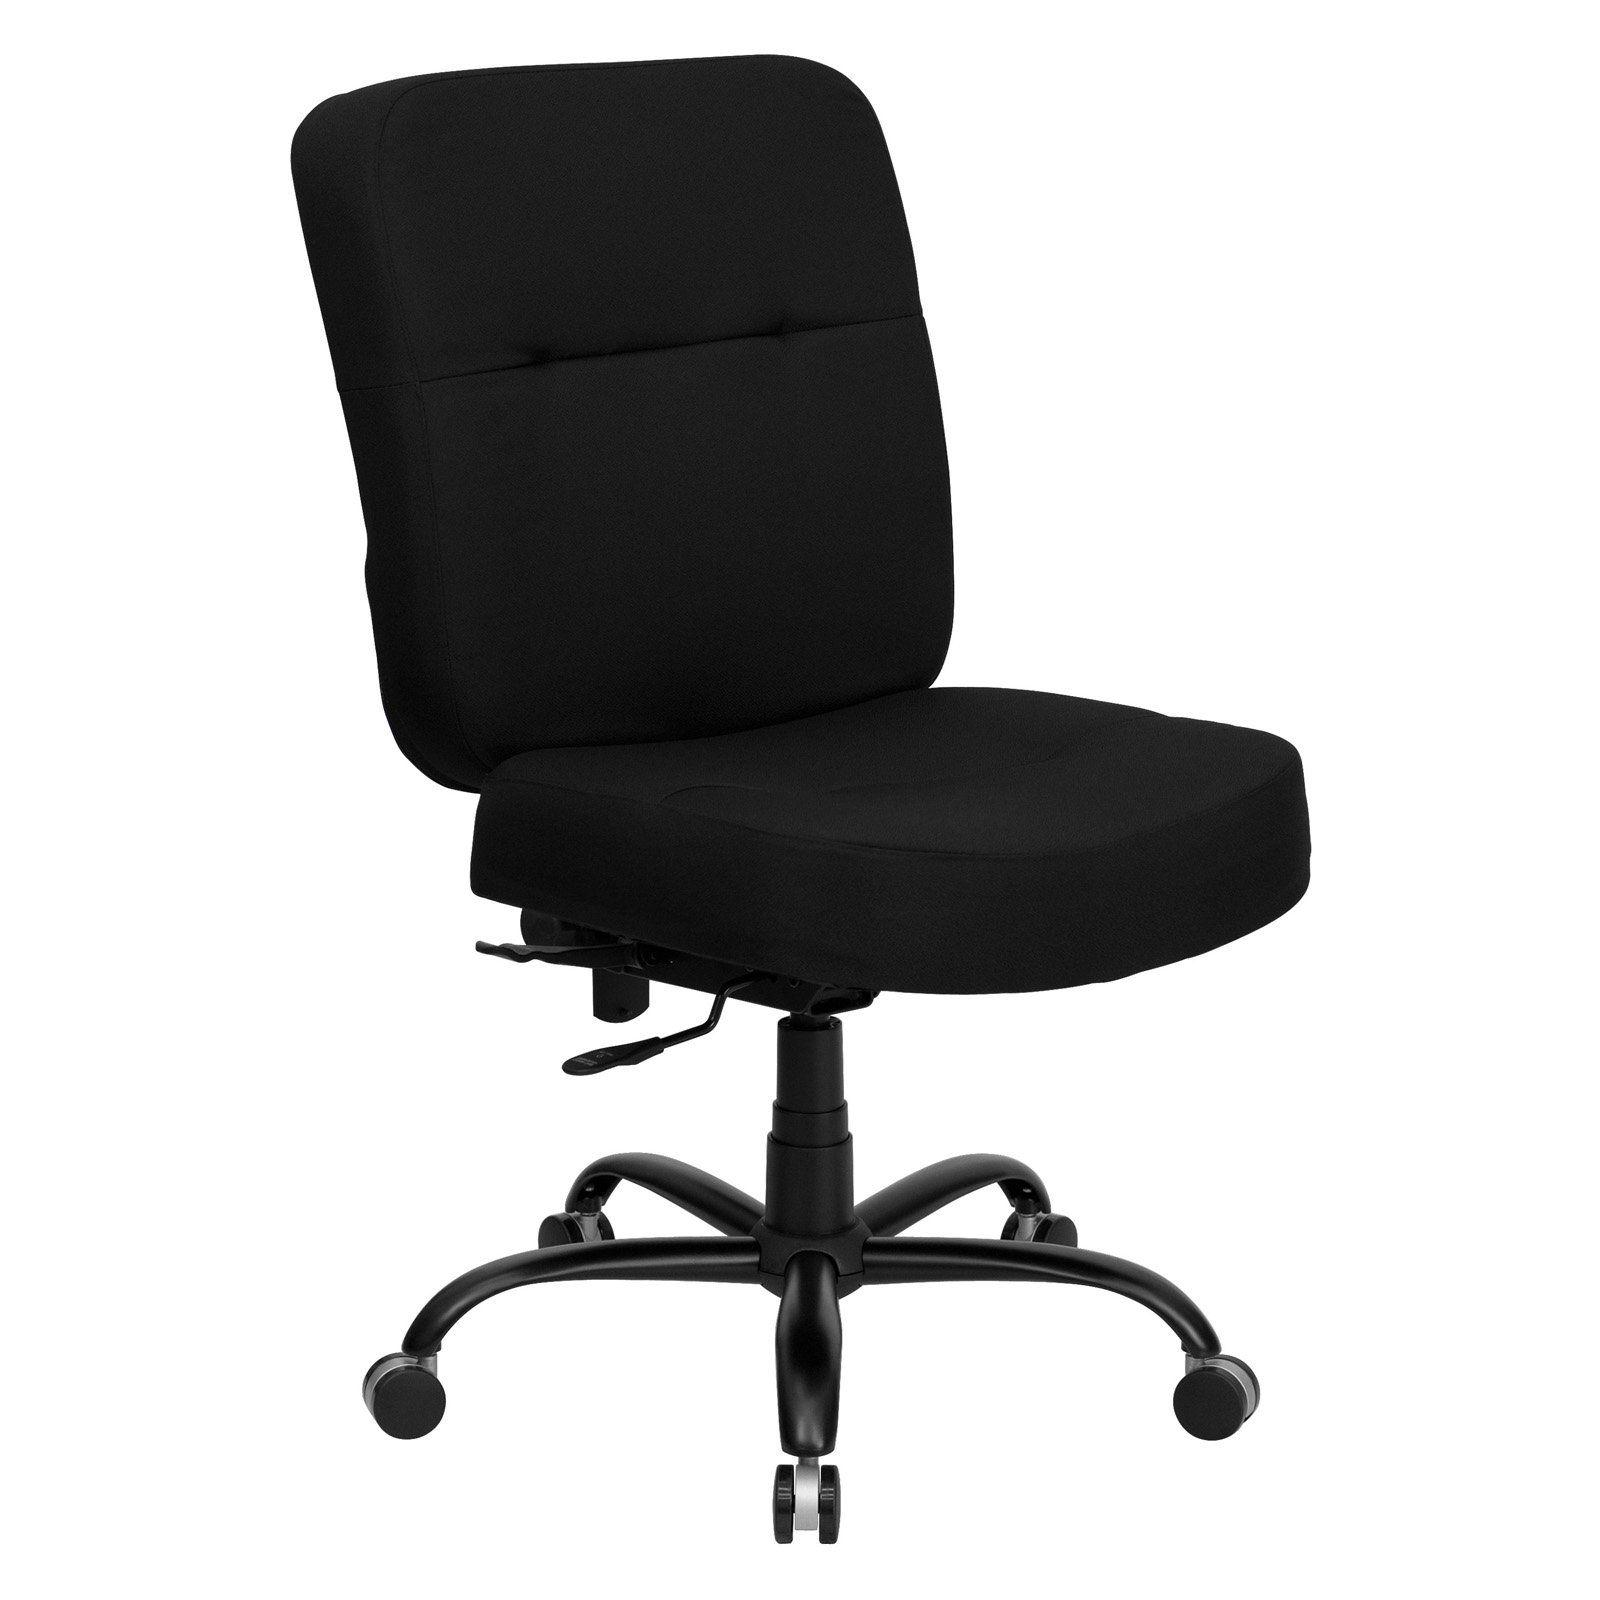 Wondrous Flash Furniture Hercules Series 500 Lbs Capacity Big And Interior Design Ideas Inesswwsoteloinfo